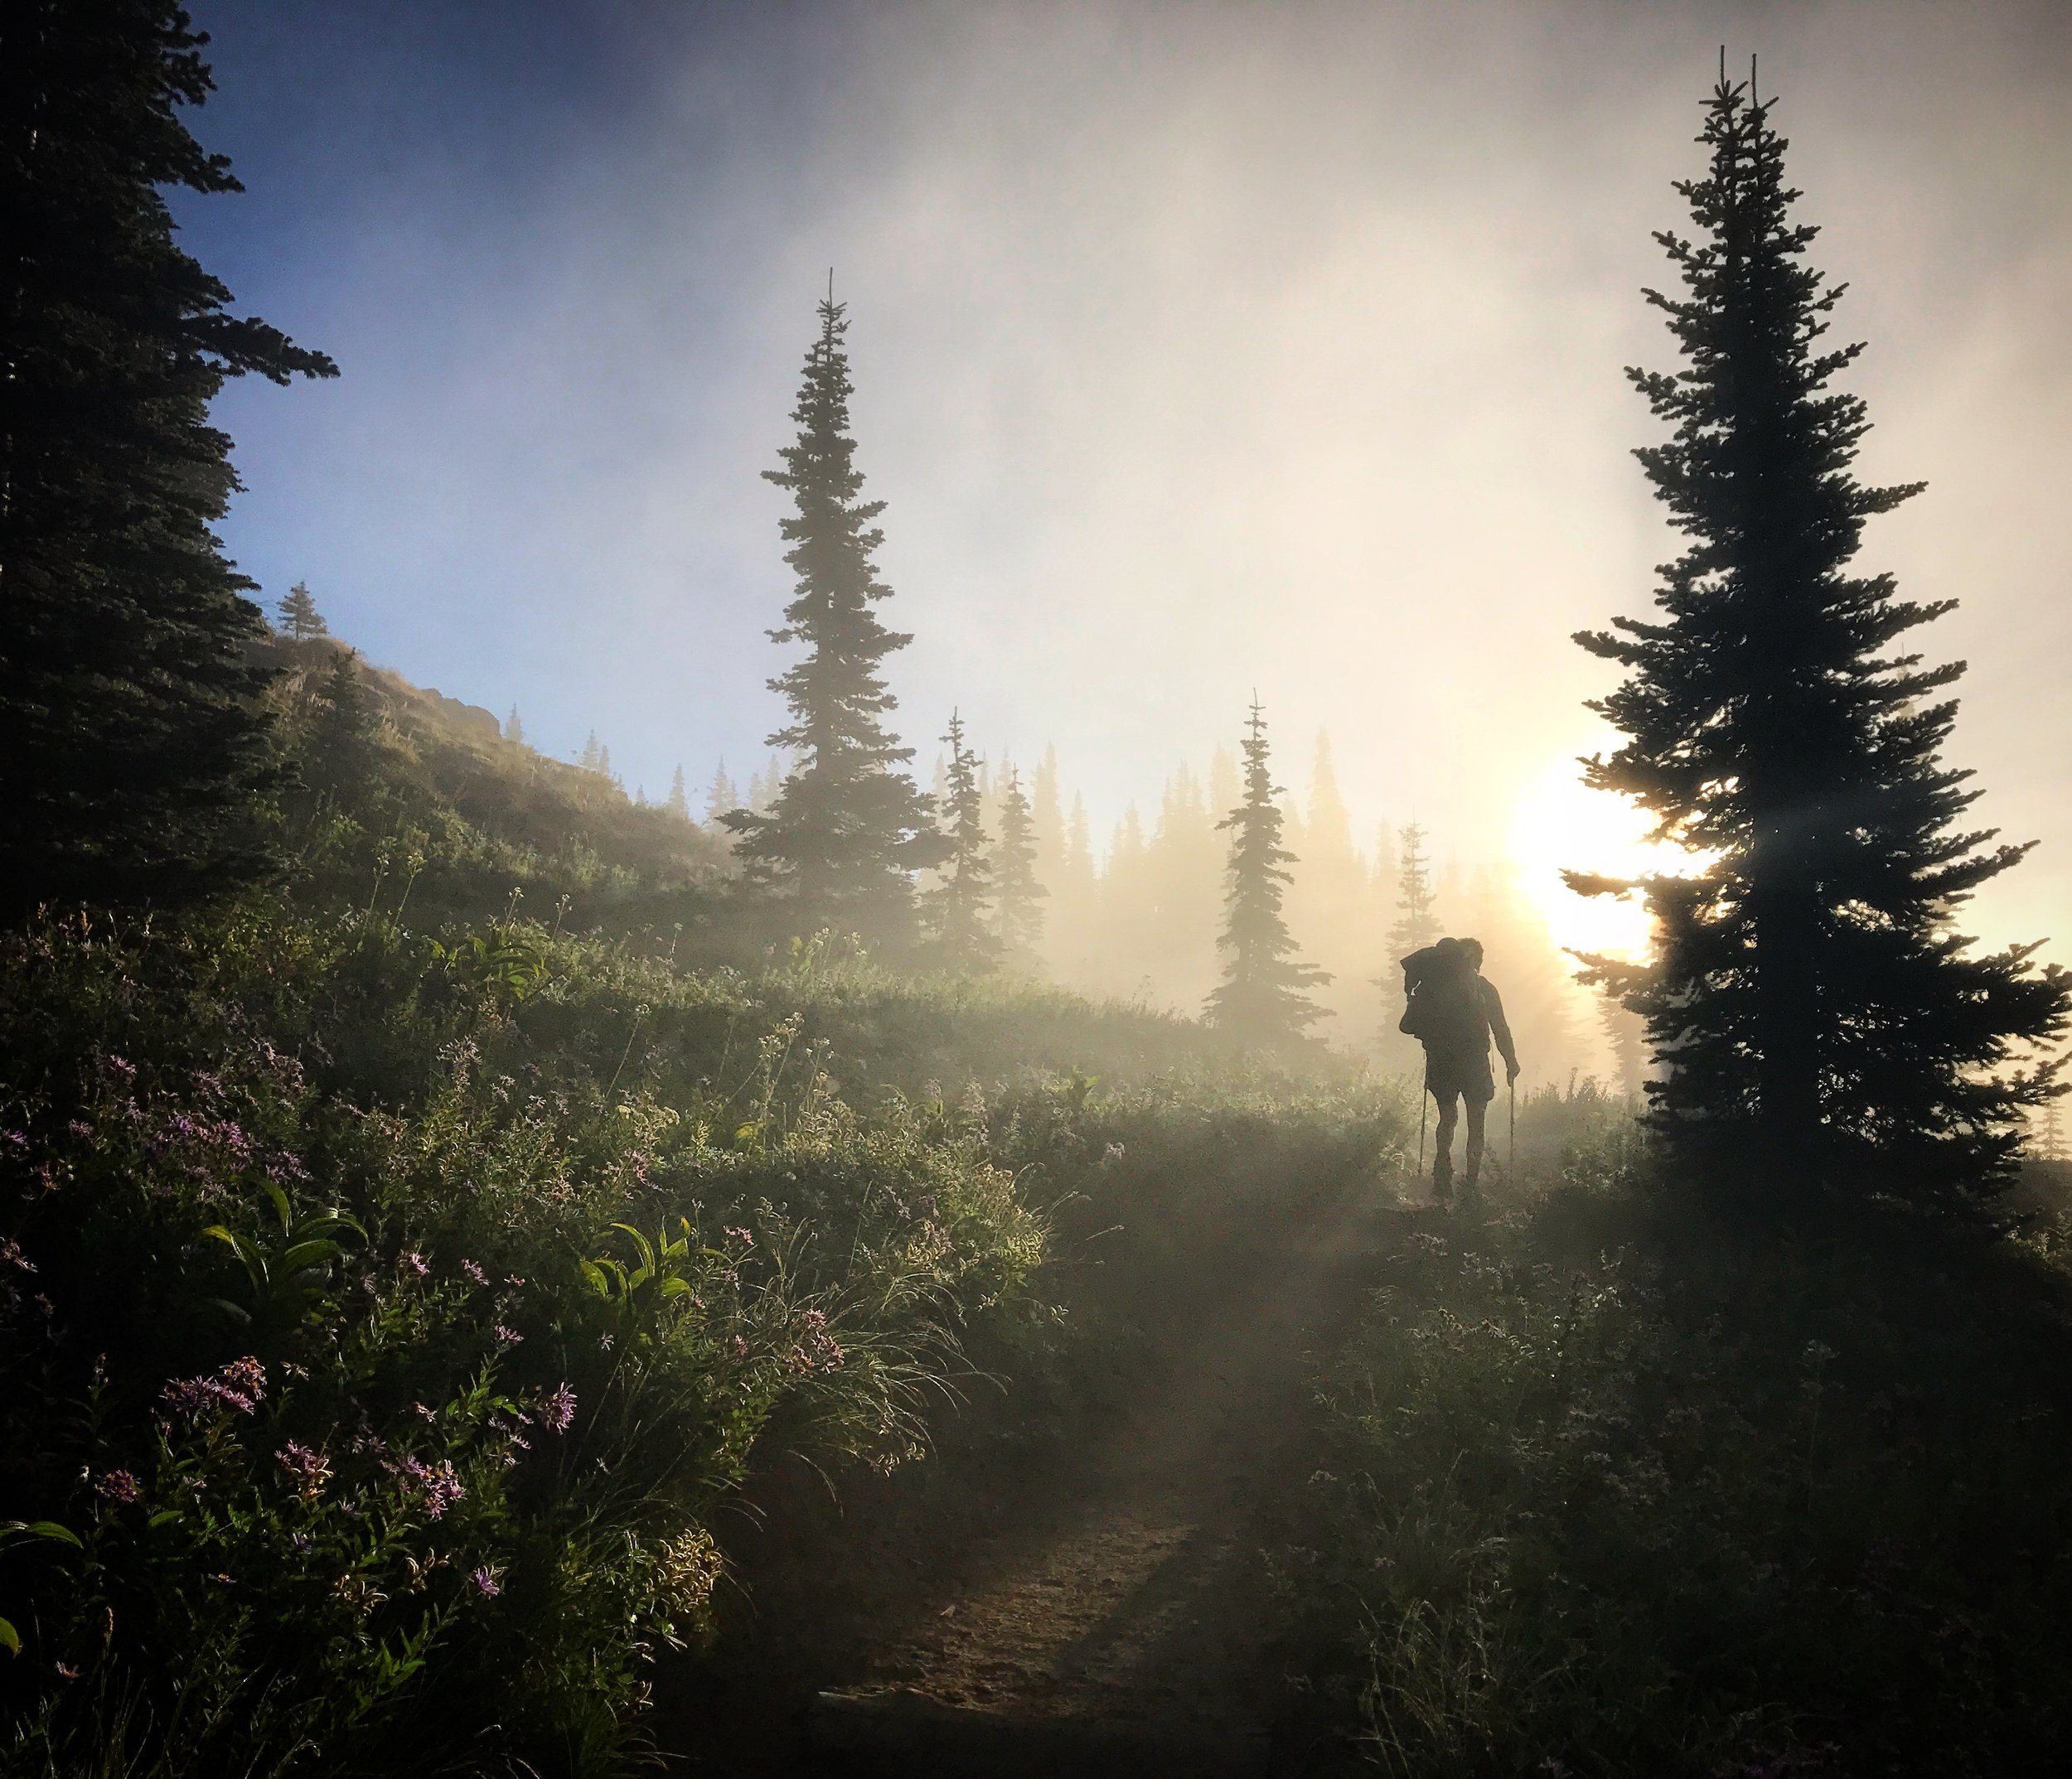 An amazing morning near Mt. Rainier